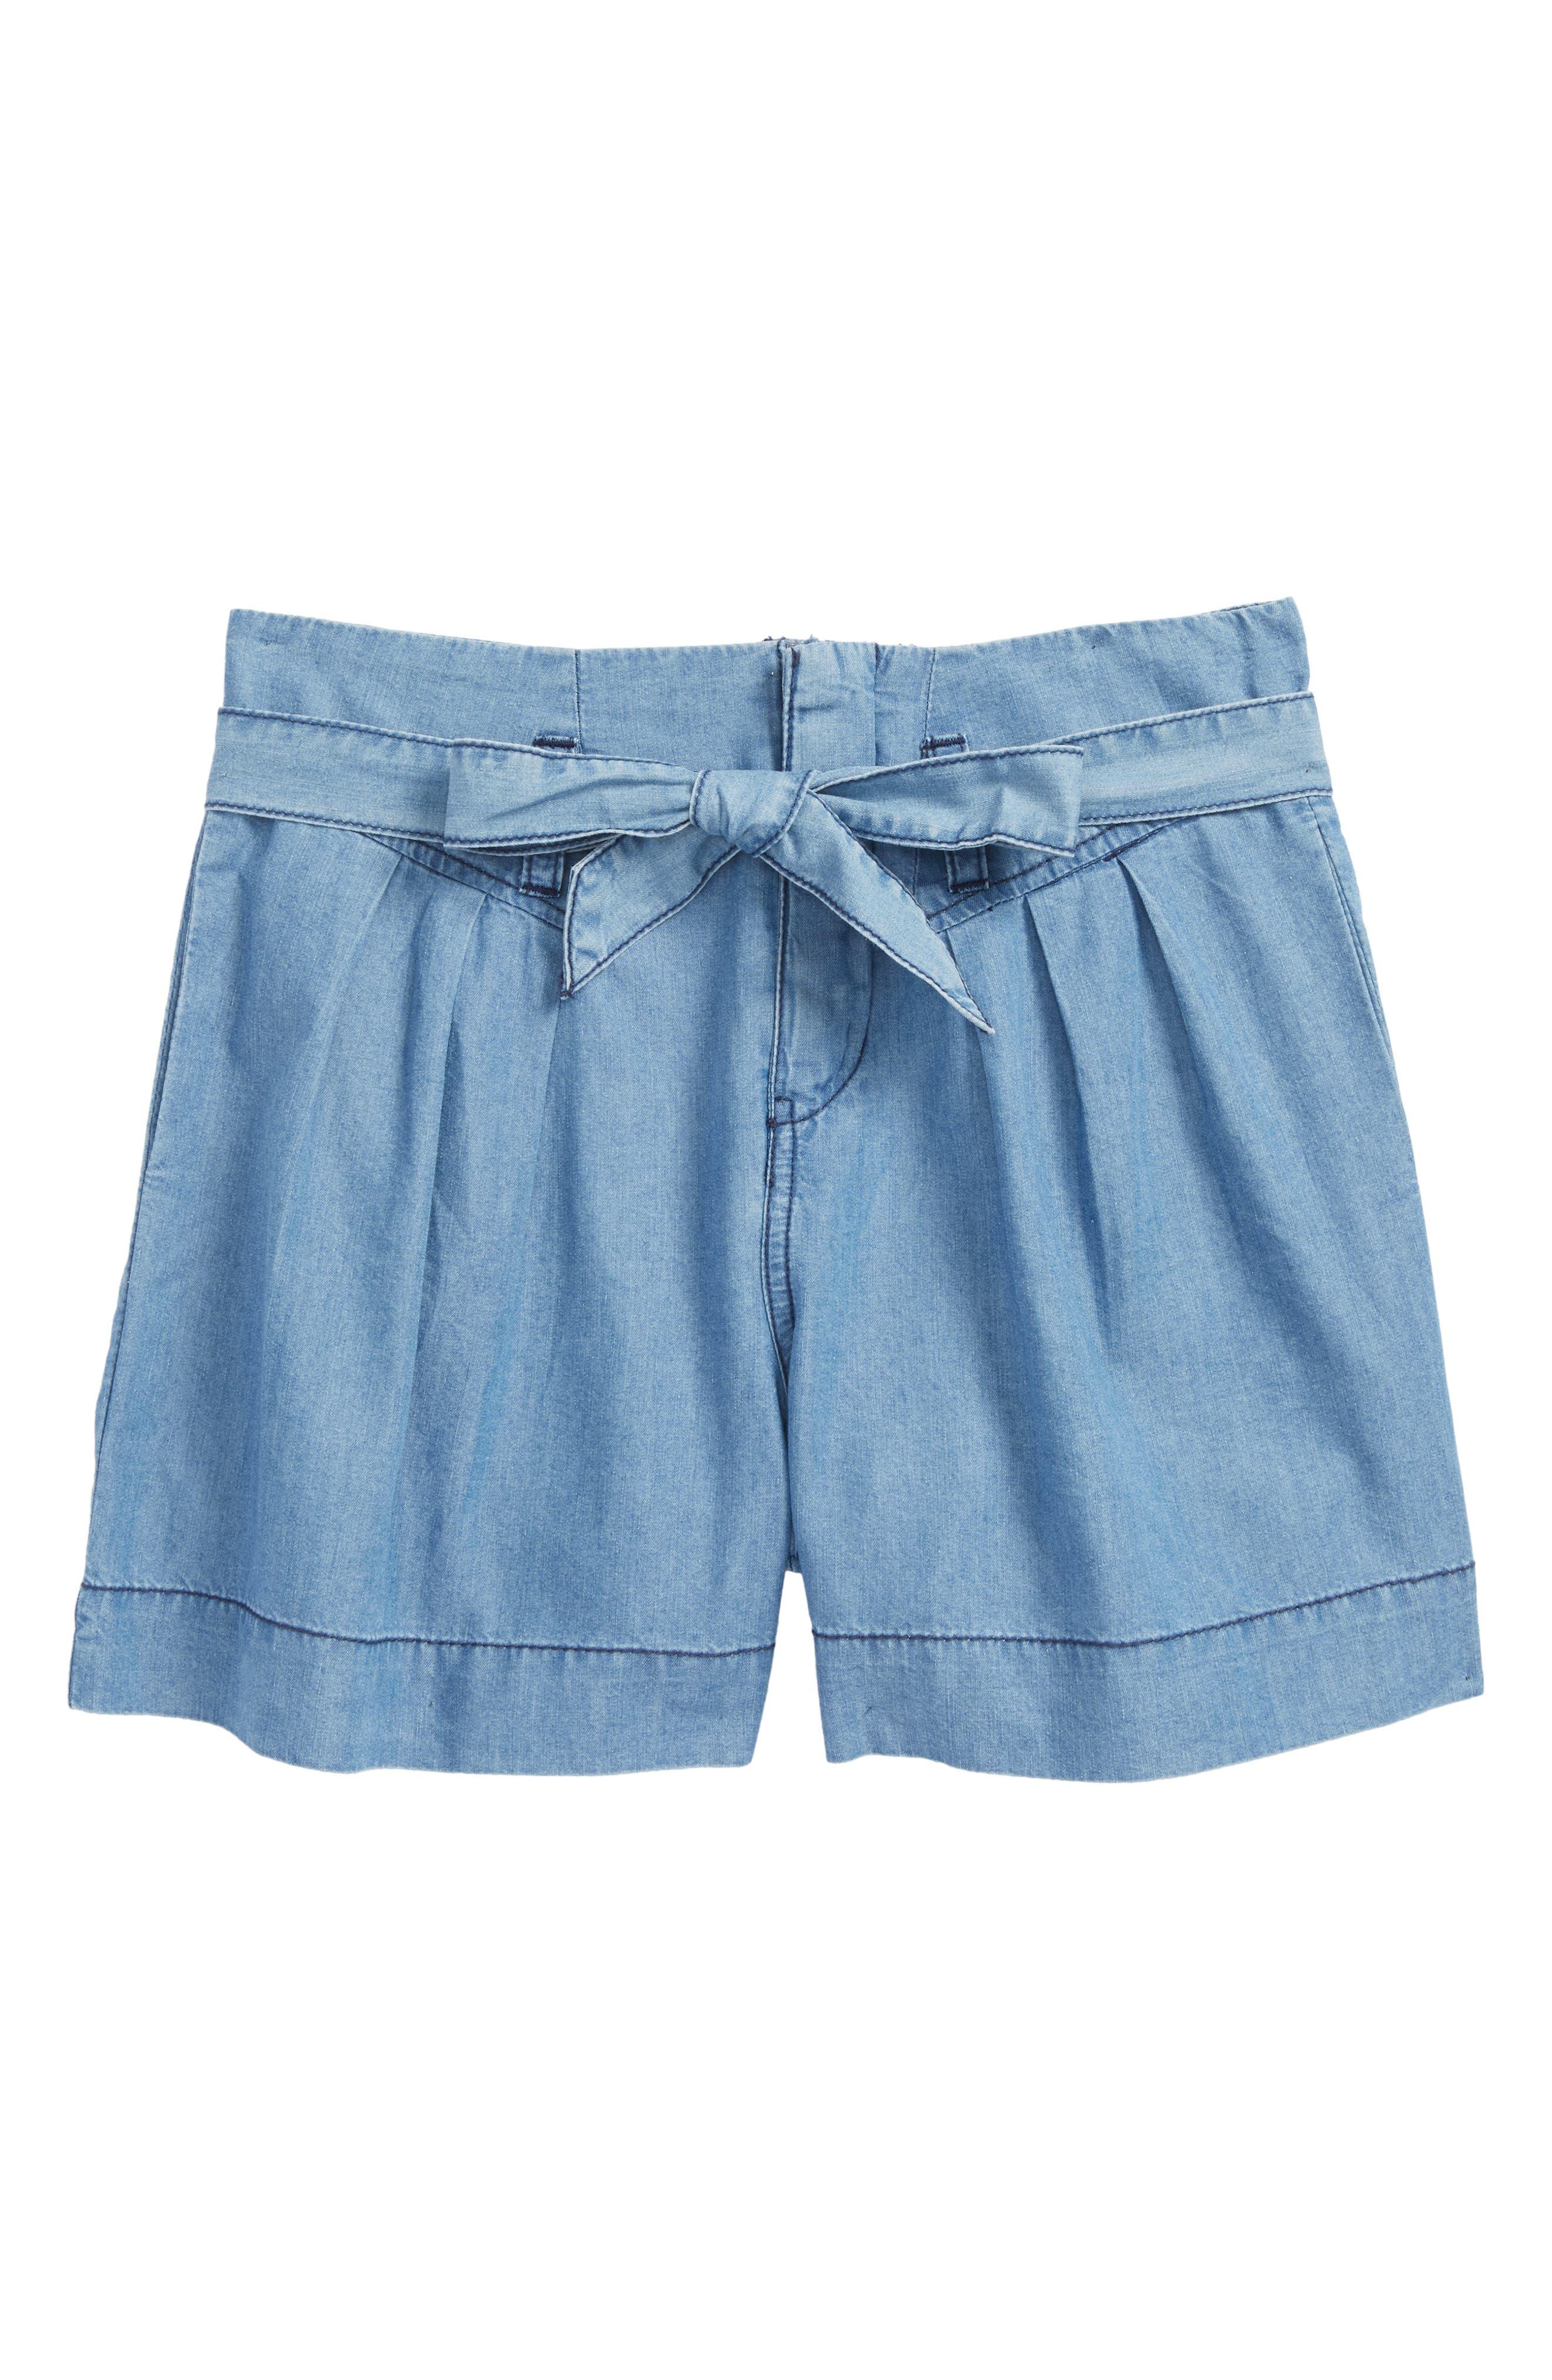 Habitual Girl Lolly Chambray Shorts (Big Girls)